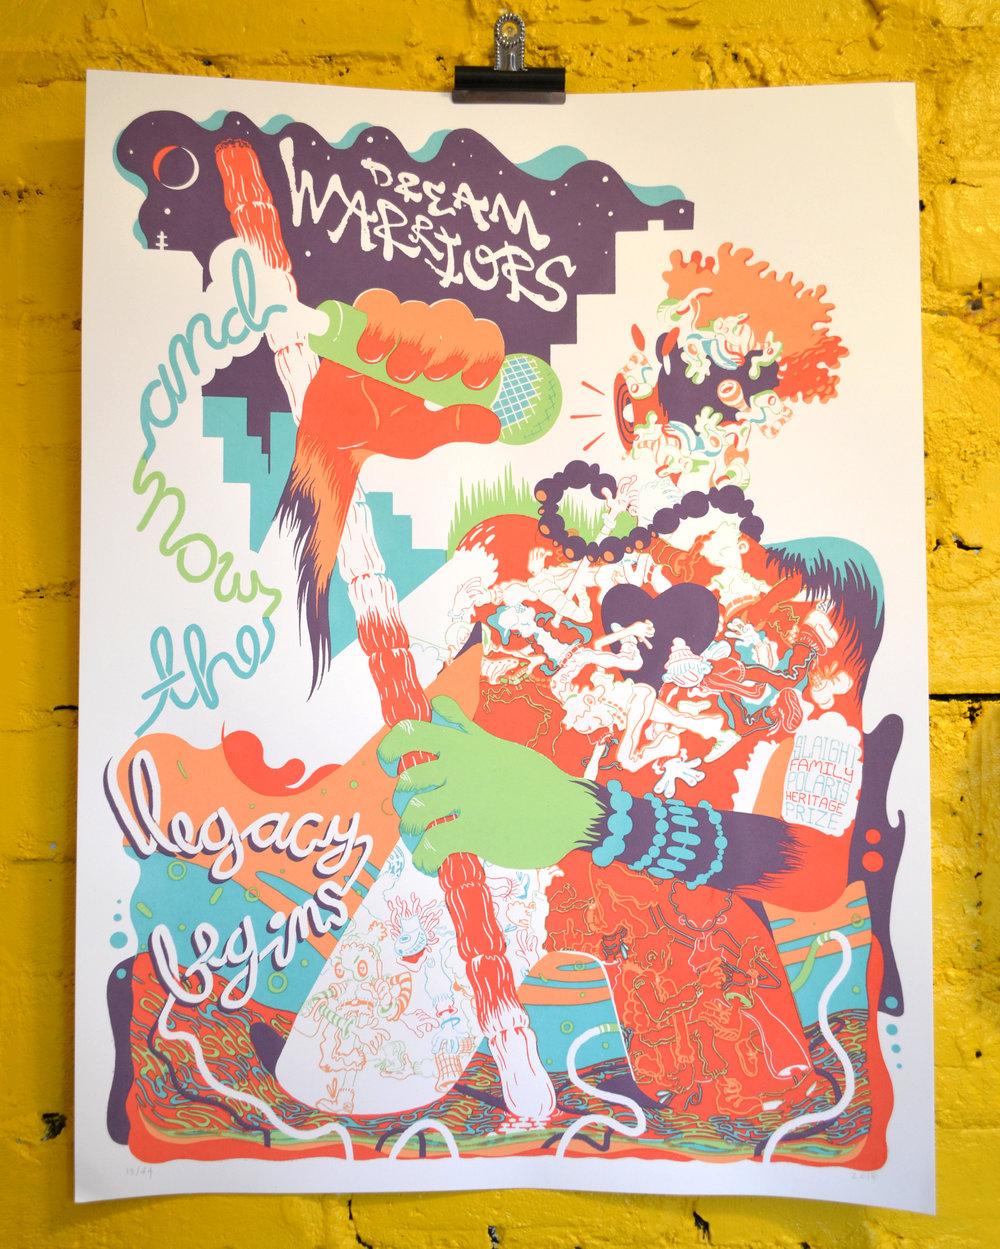 Slaight Family Polaris Heritage Prize Poster - Dream Warriors